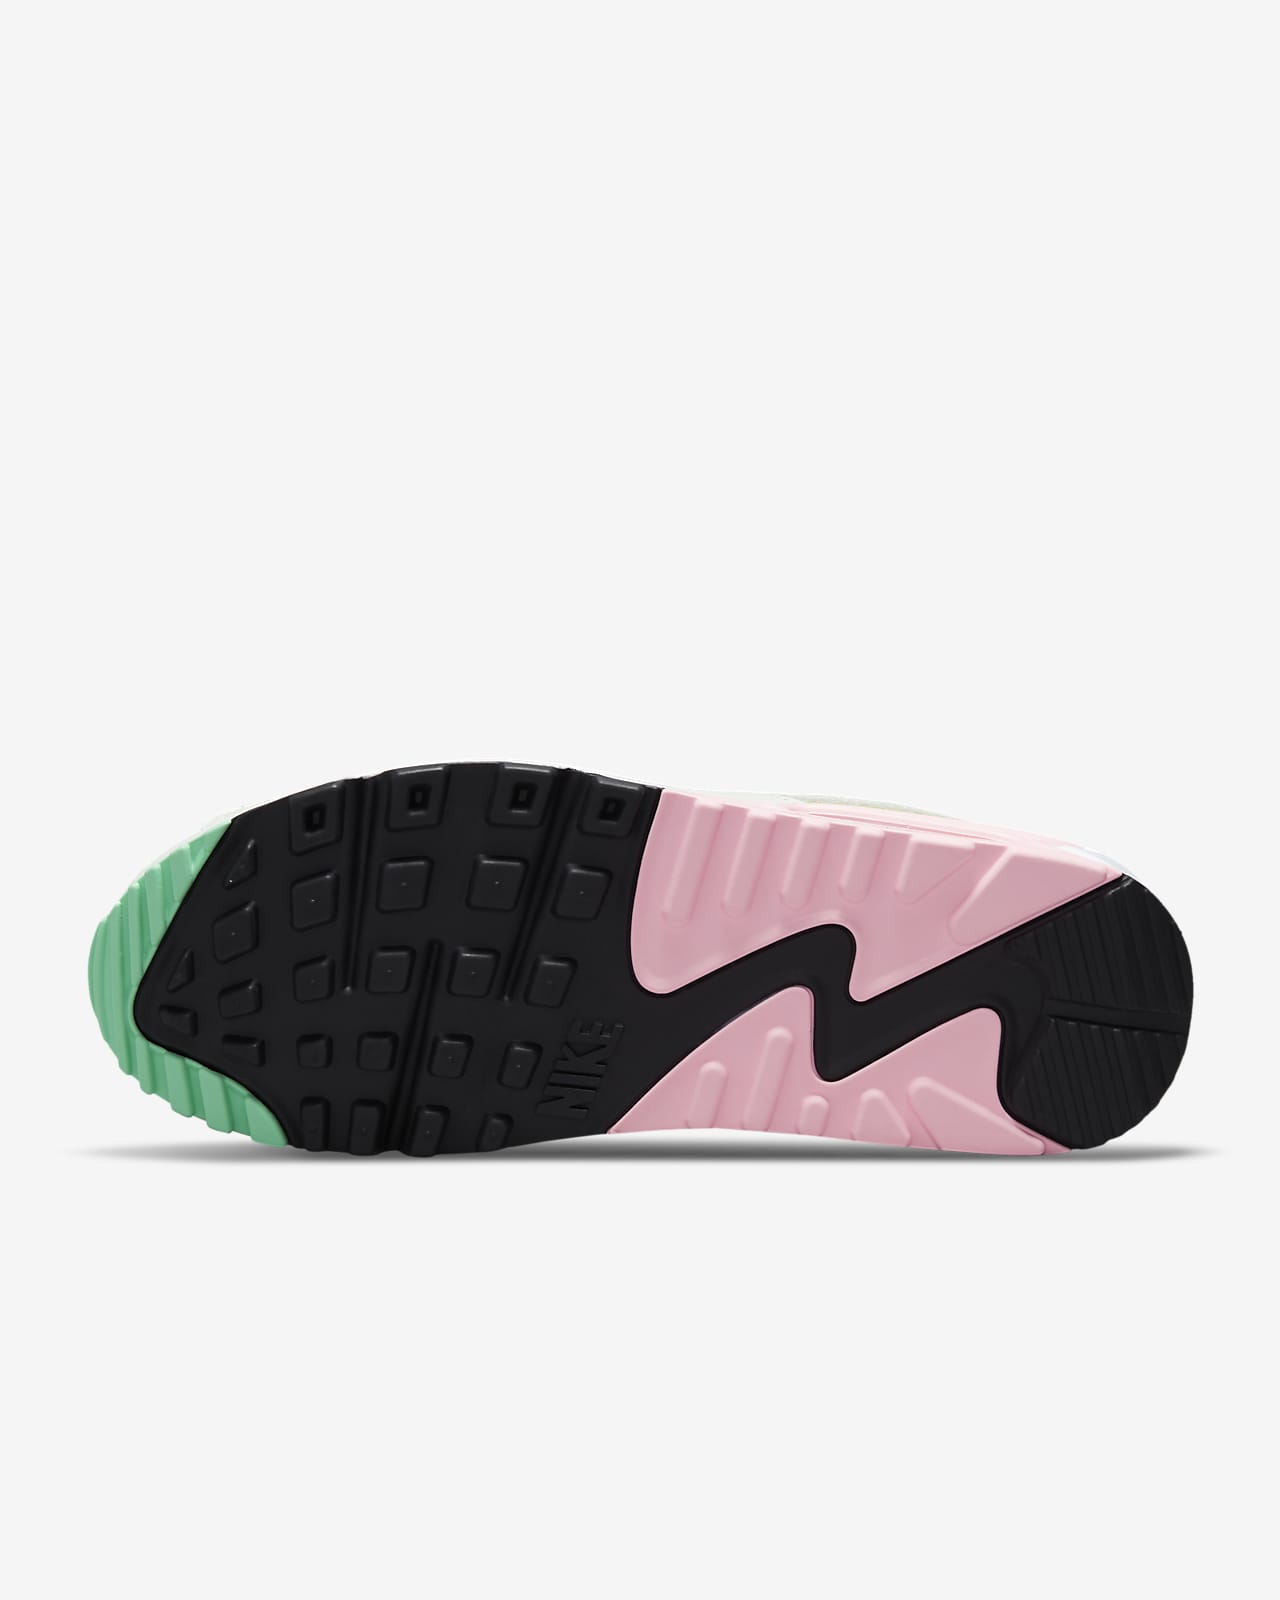 nike air max 90 womens pink and black